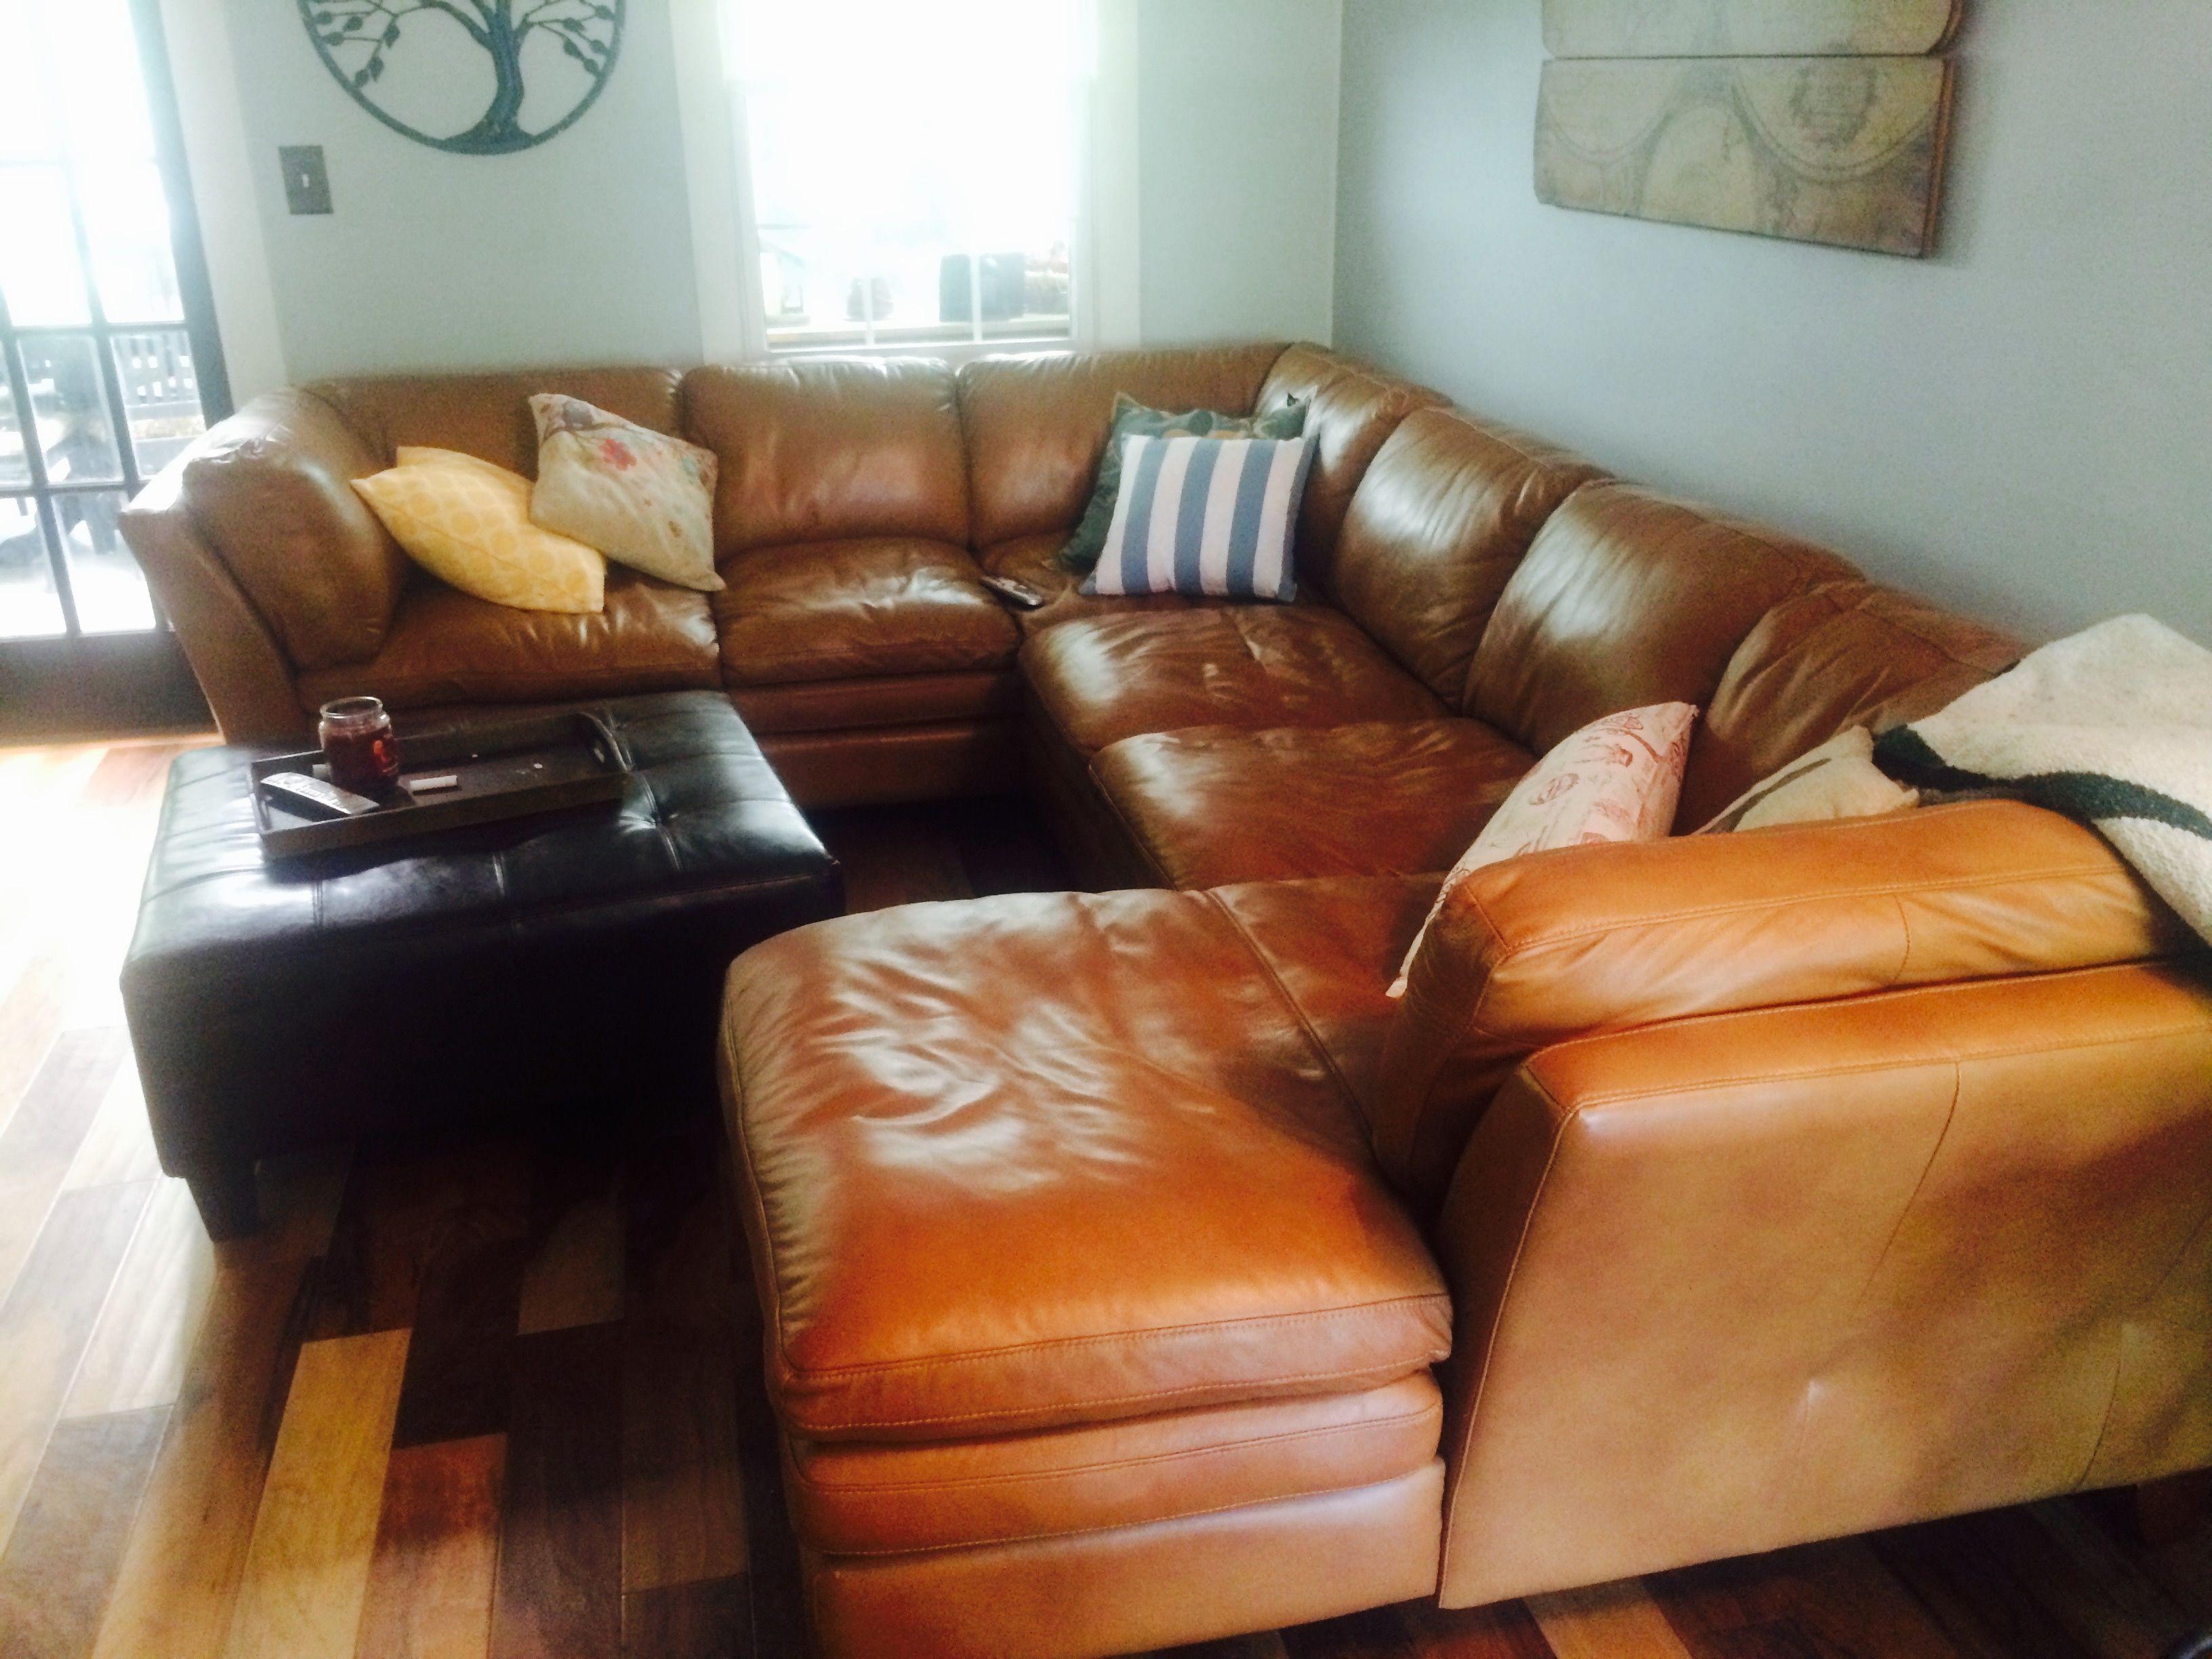 Soft Leather Sectional 1 900 00 Leather Sectional Sectional